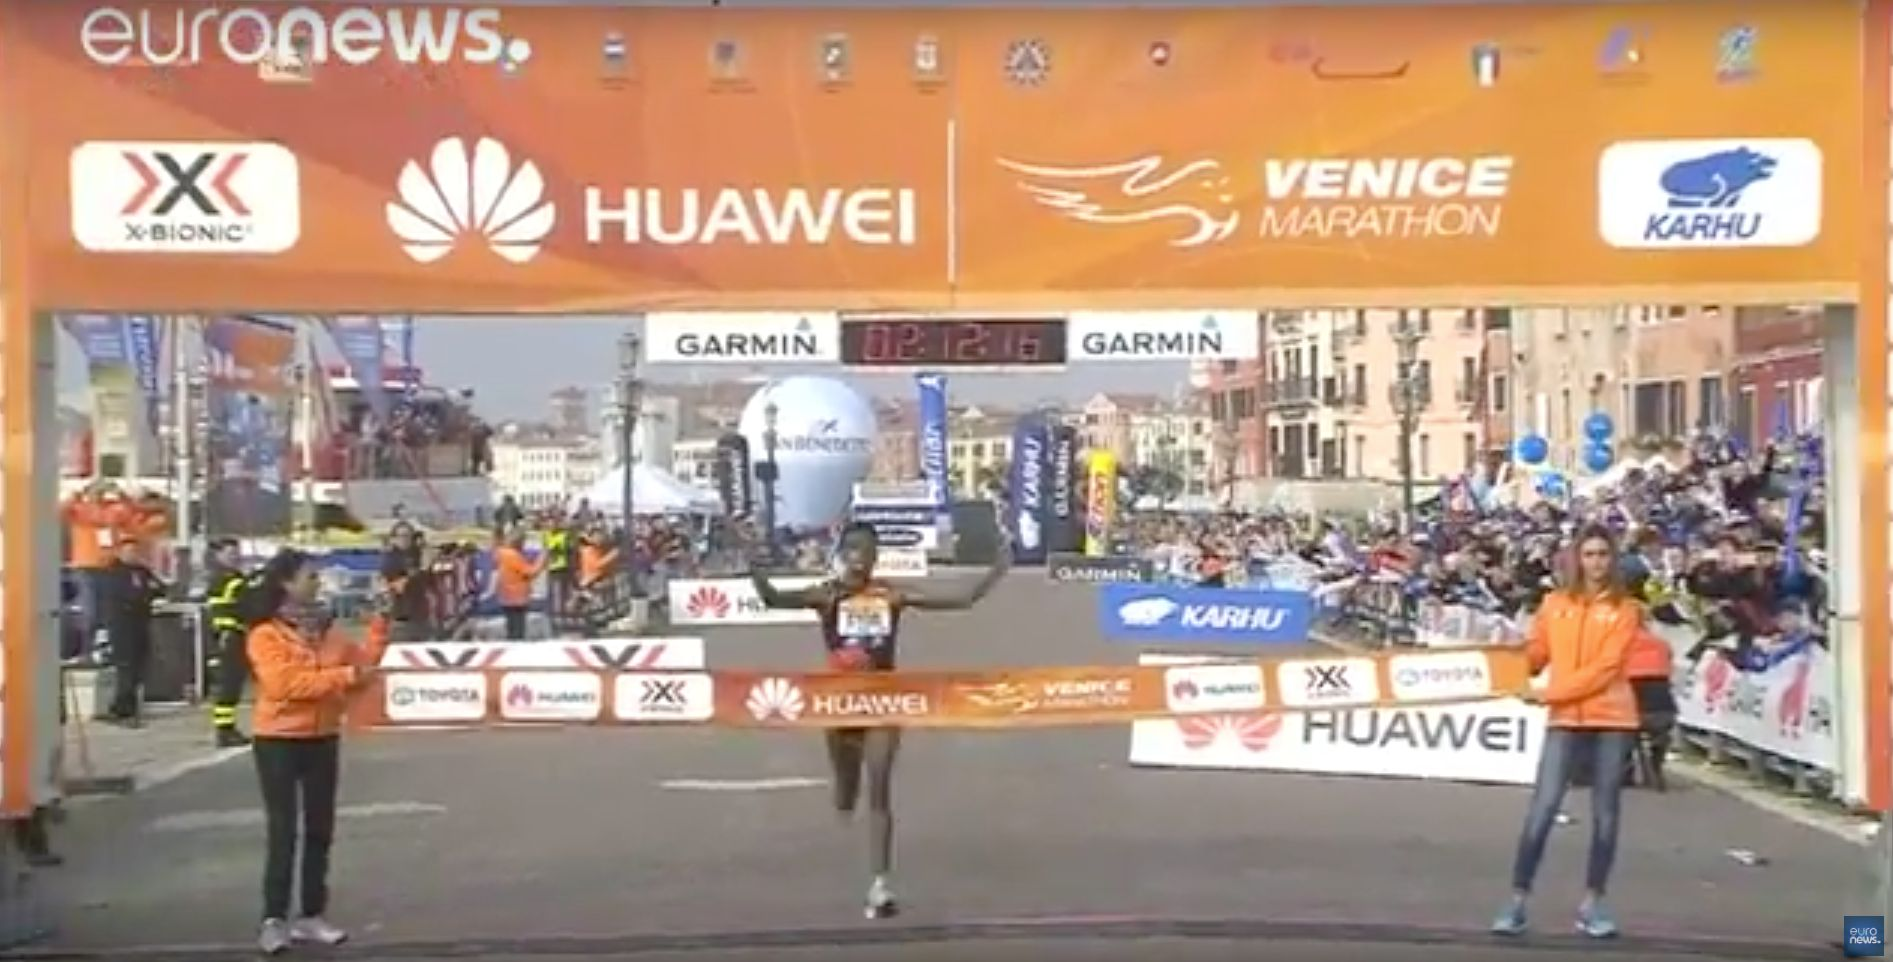 Eyob Faniel won the Huawei Venice Marathon on Sunday after six leading runners made a wrong turn